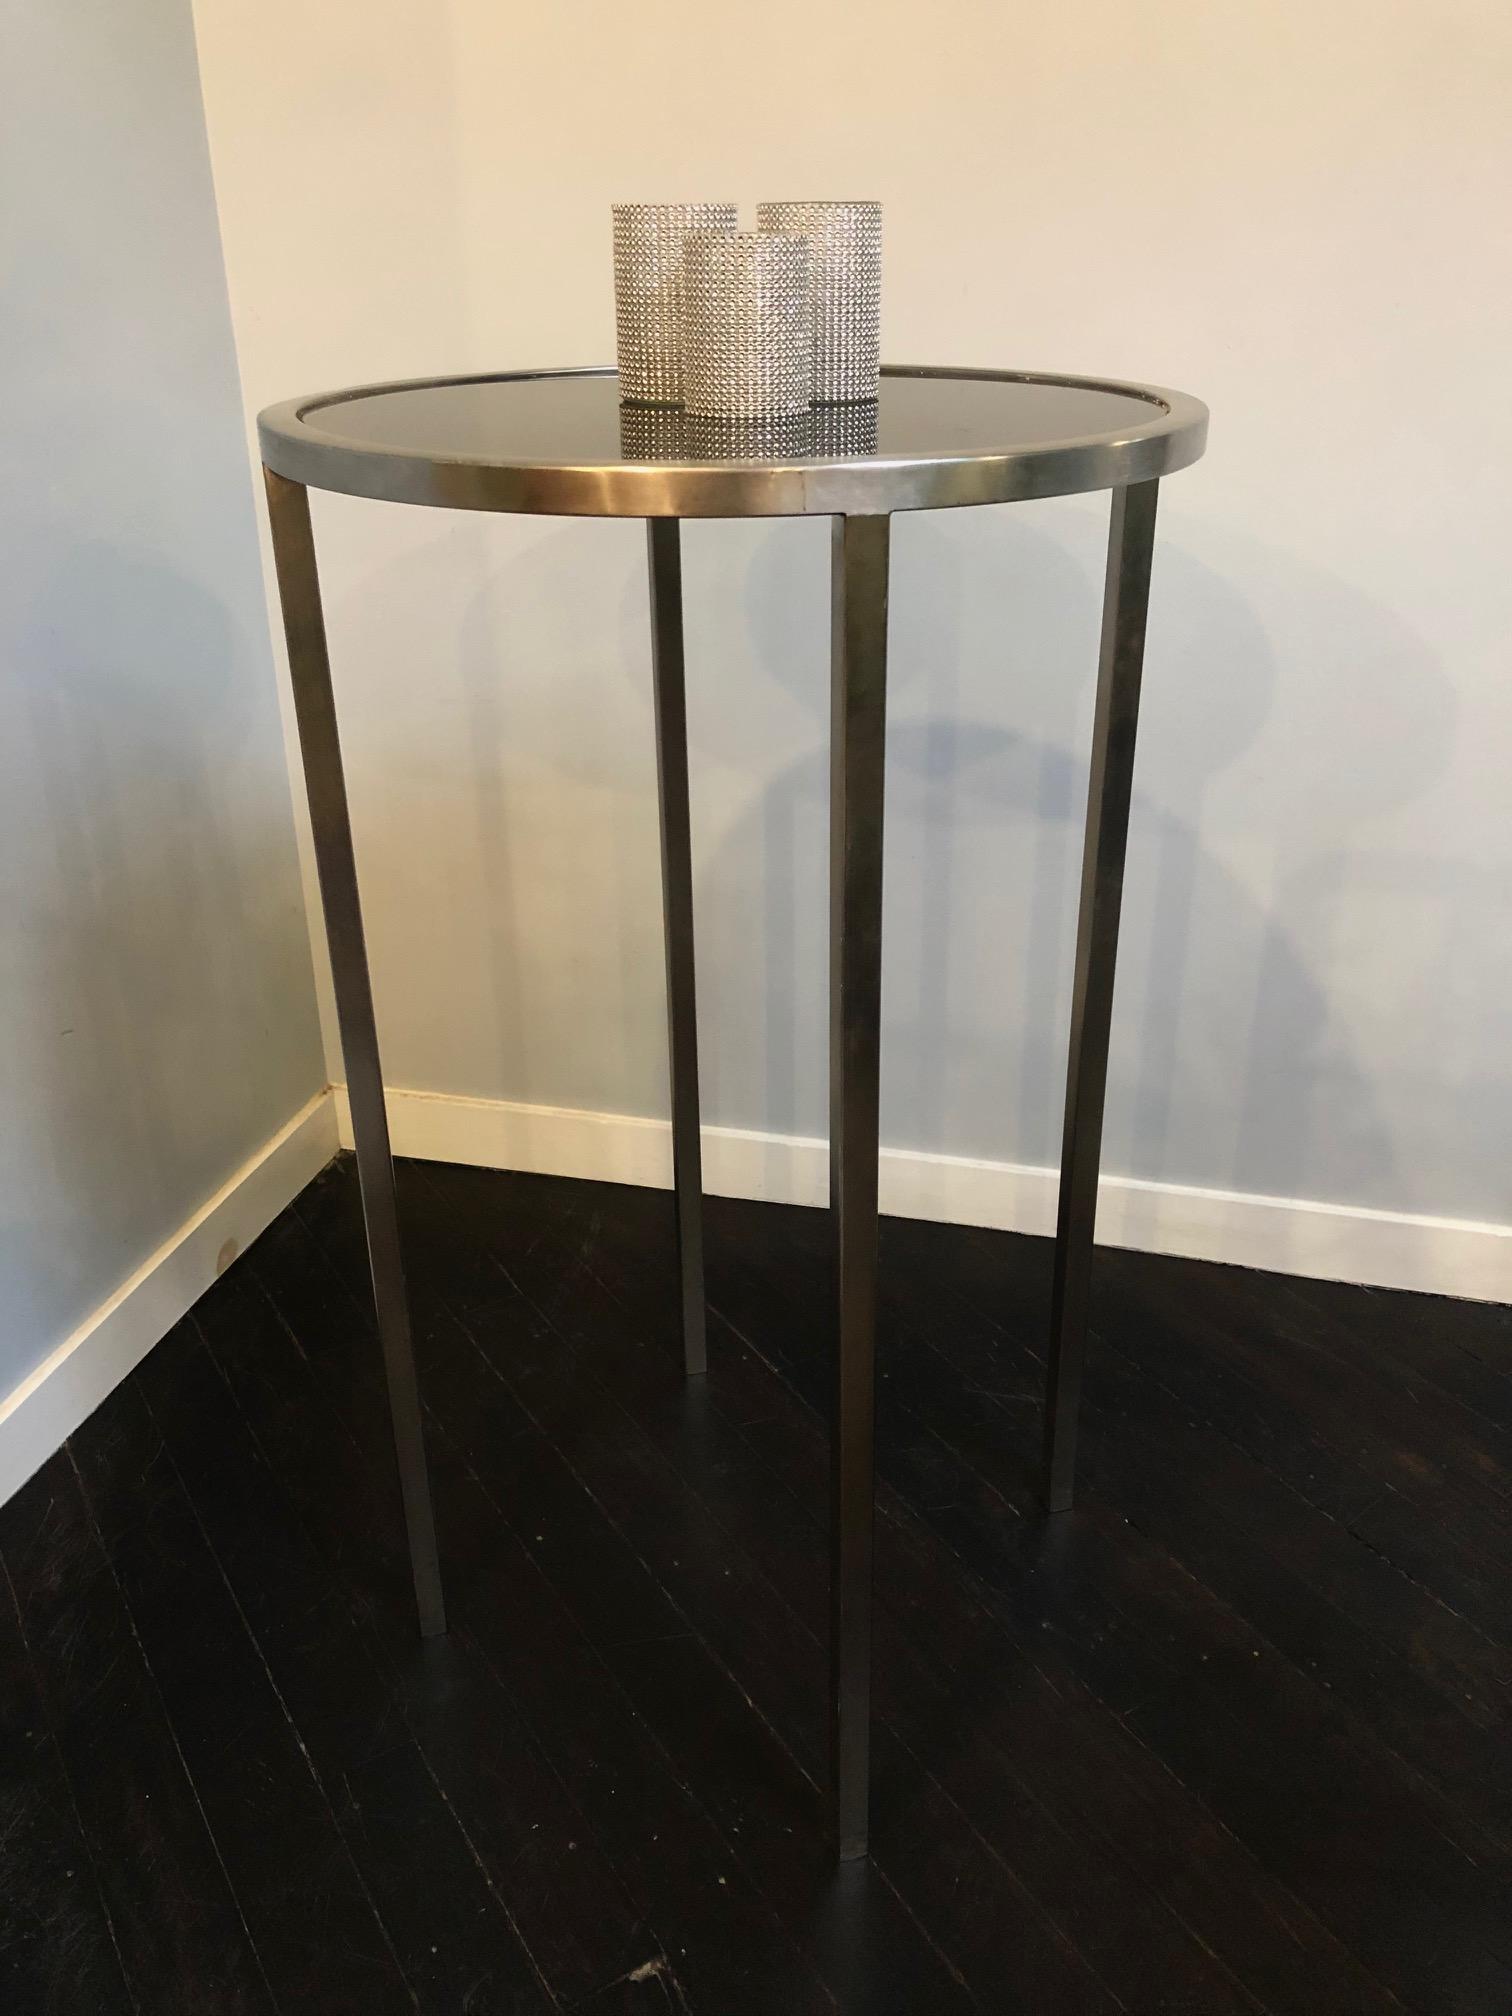 White Maria Cruiser table